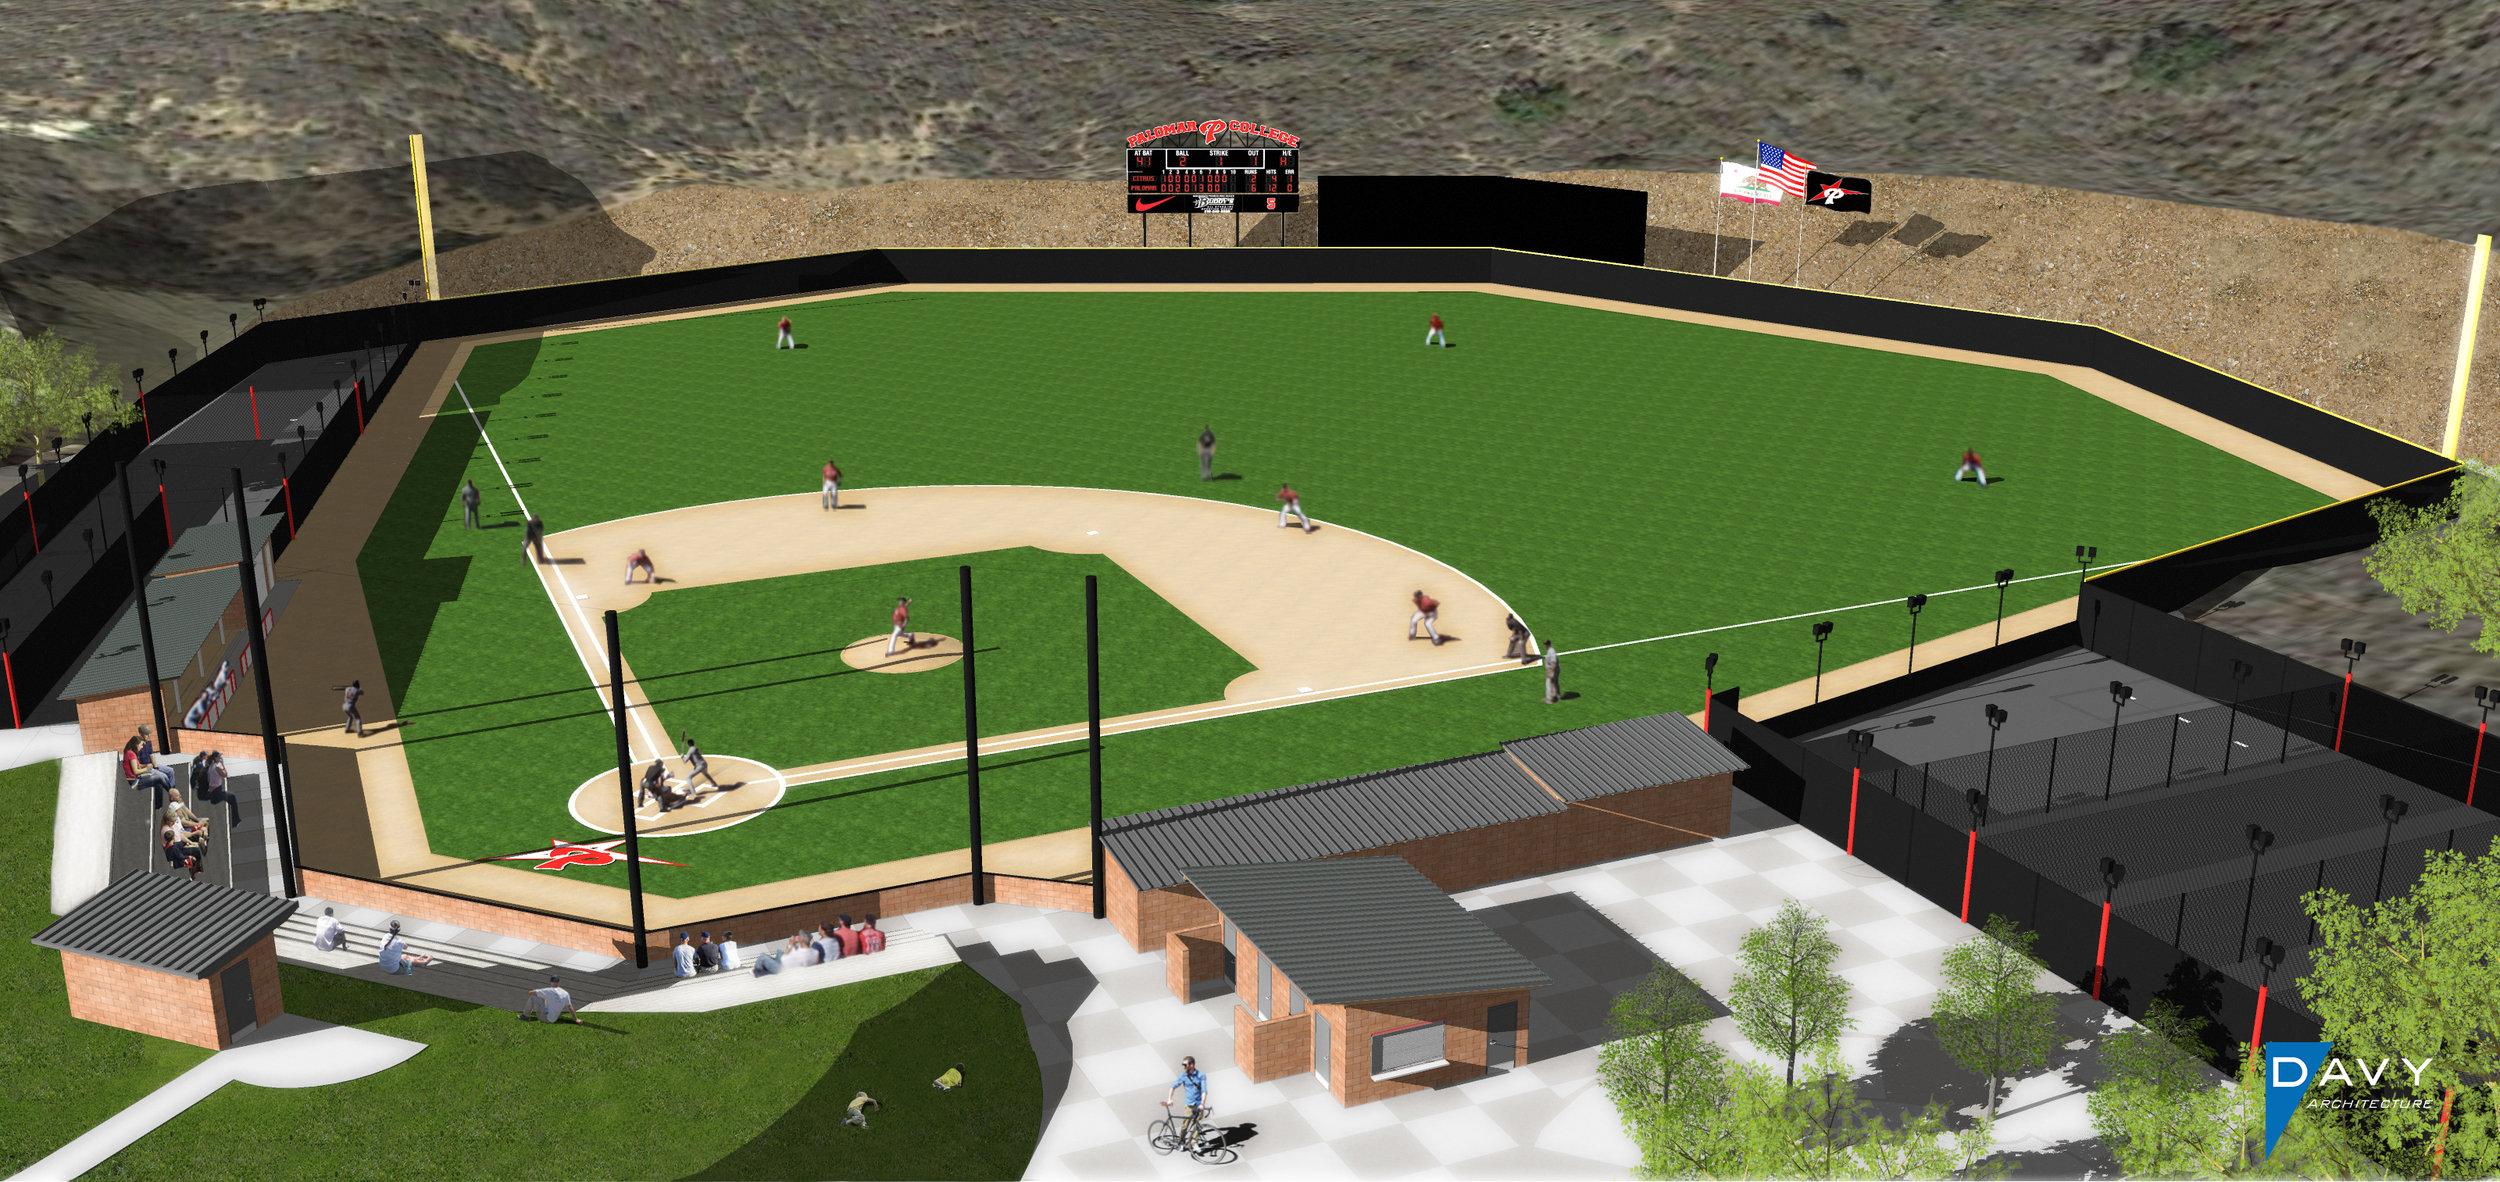 Baseball Field Rendering